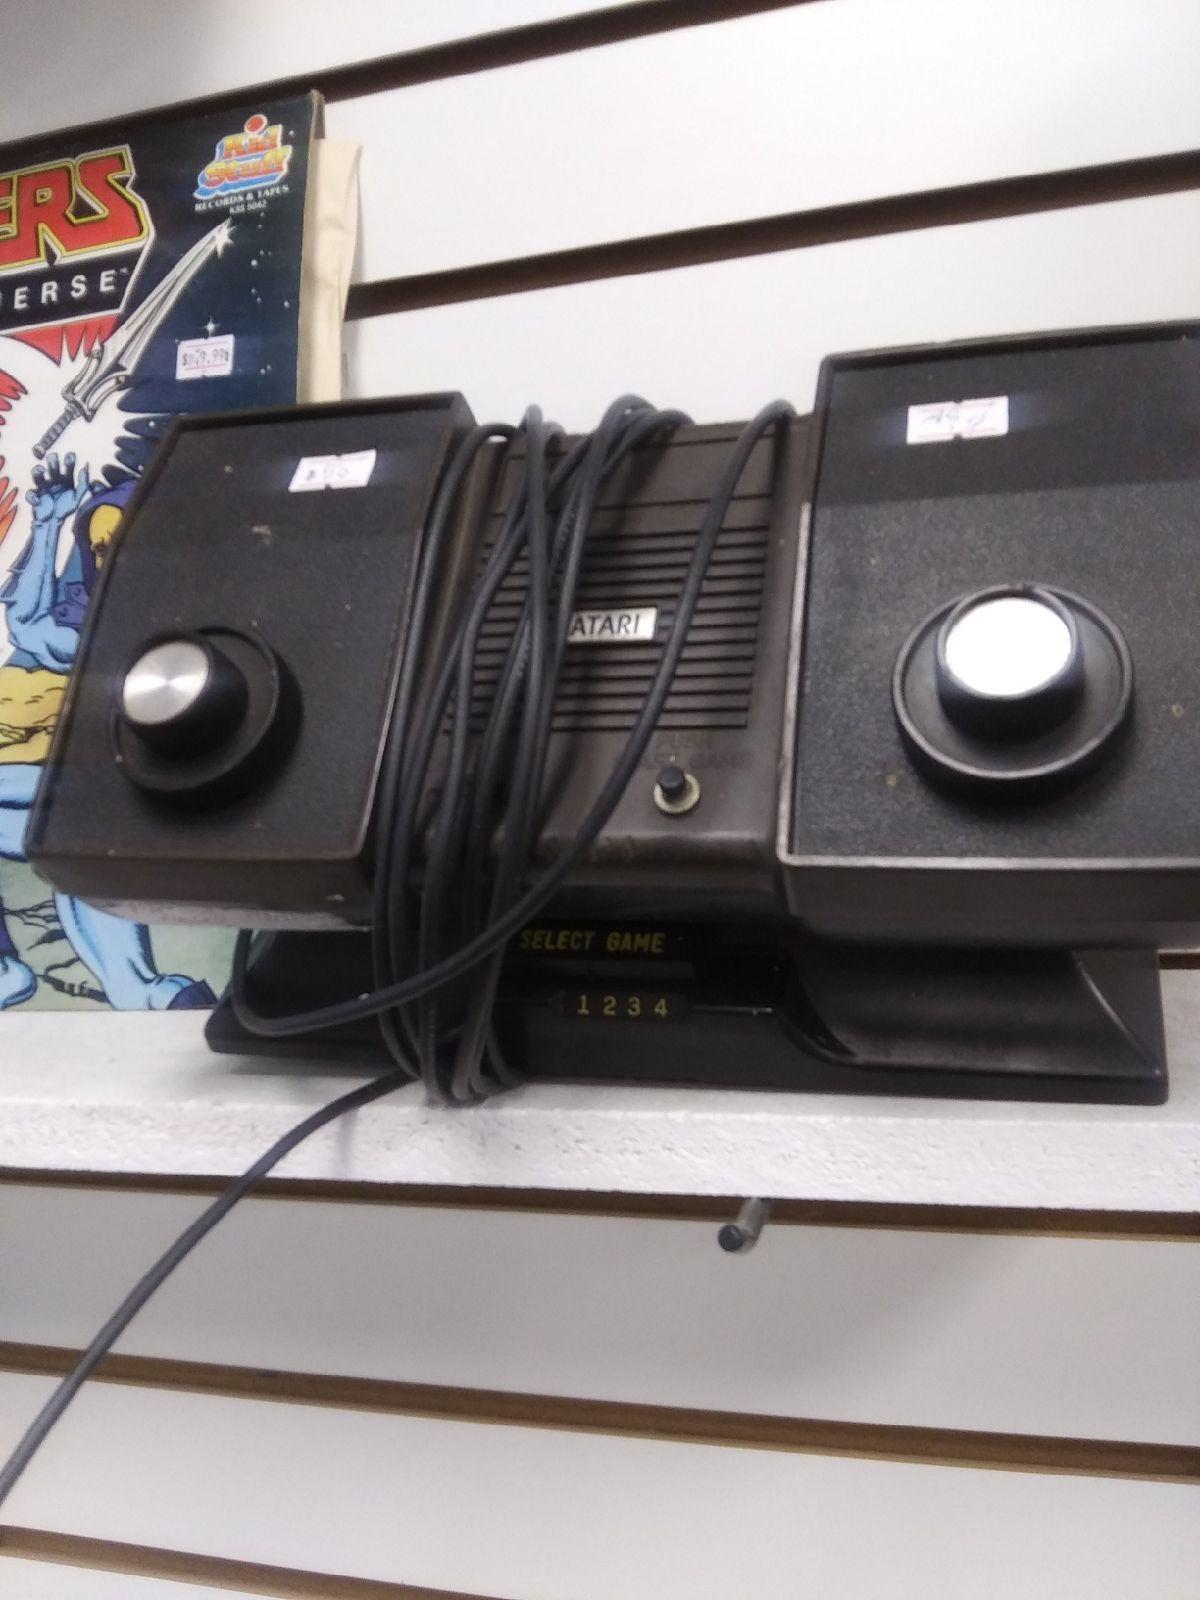 Pong 1970s Atari.